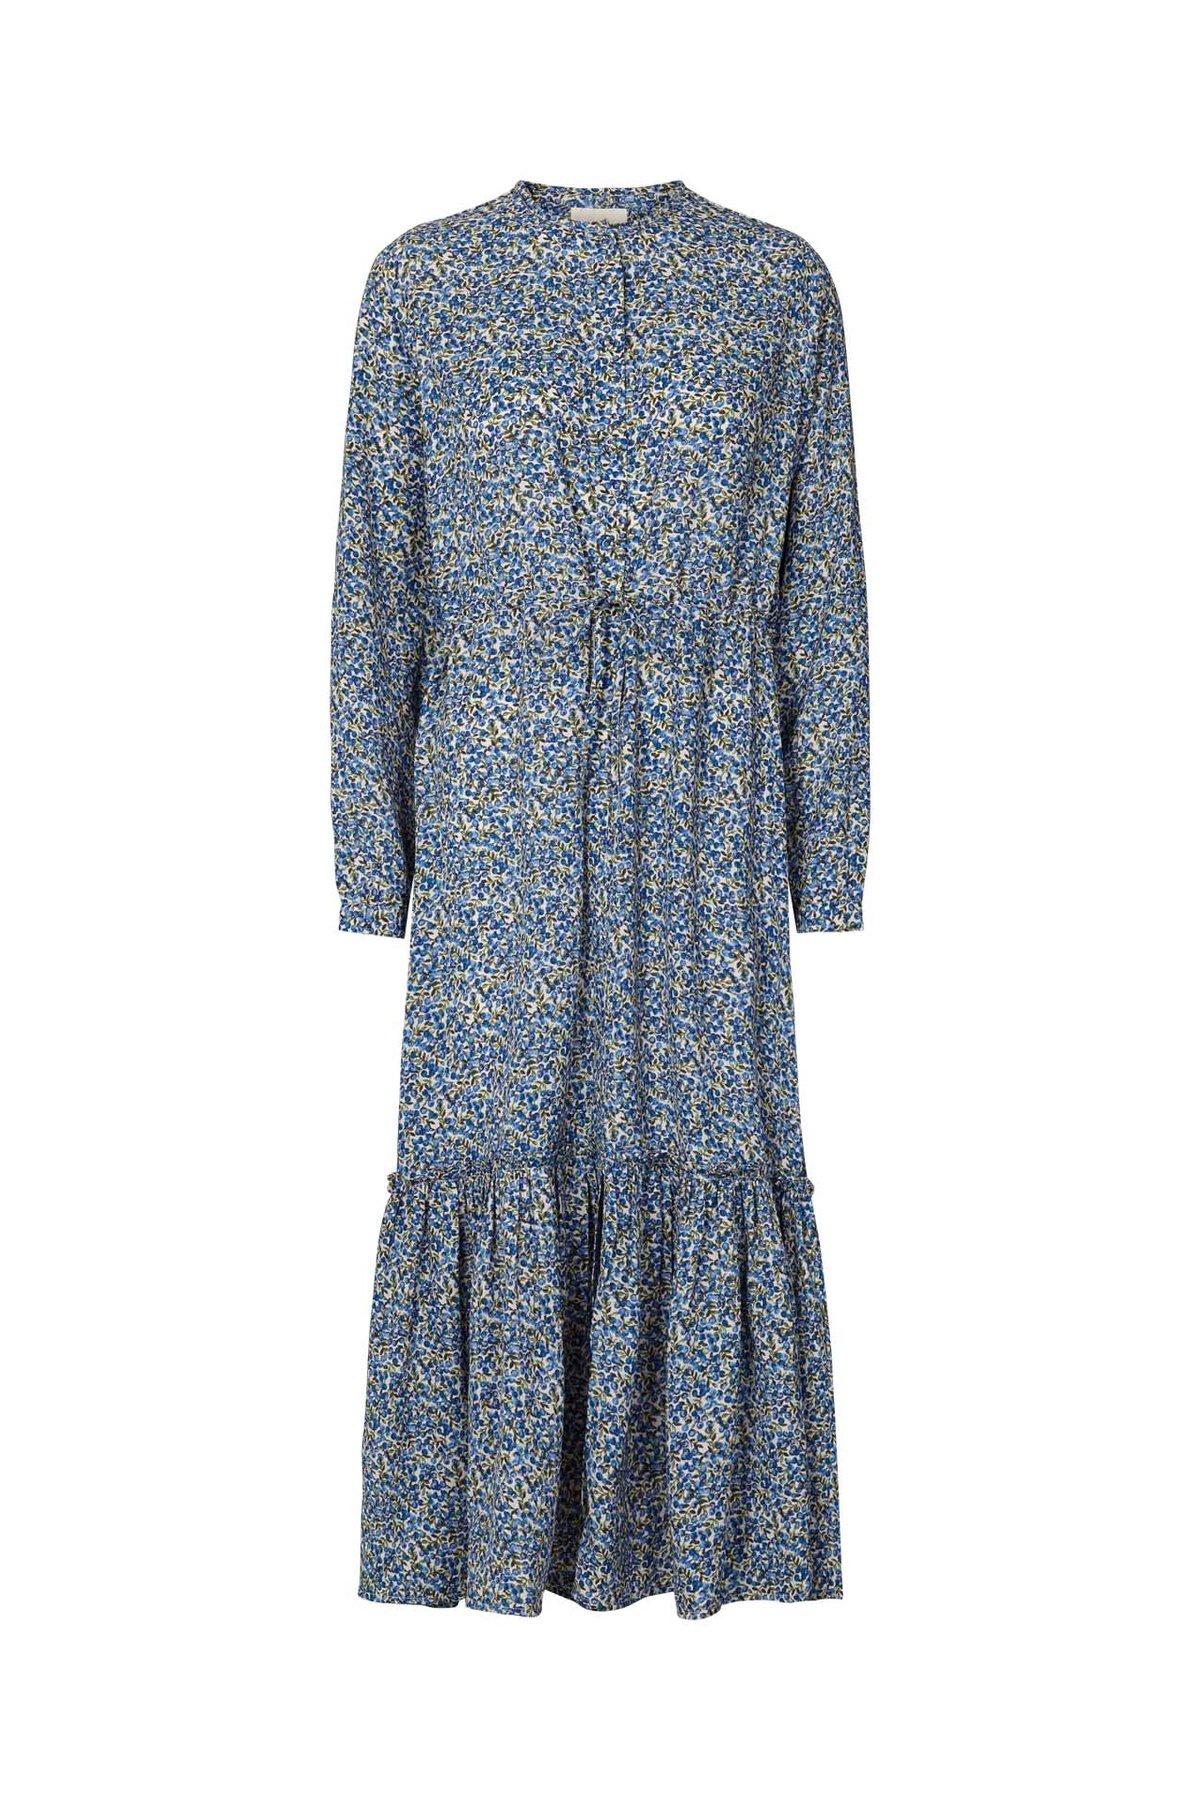 Anastacia Dress